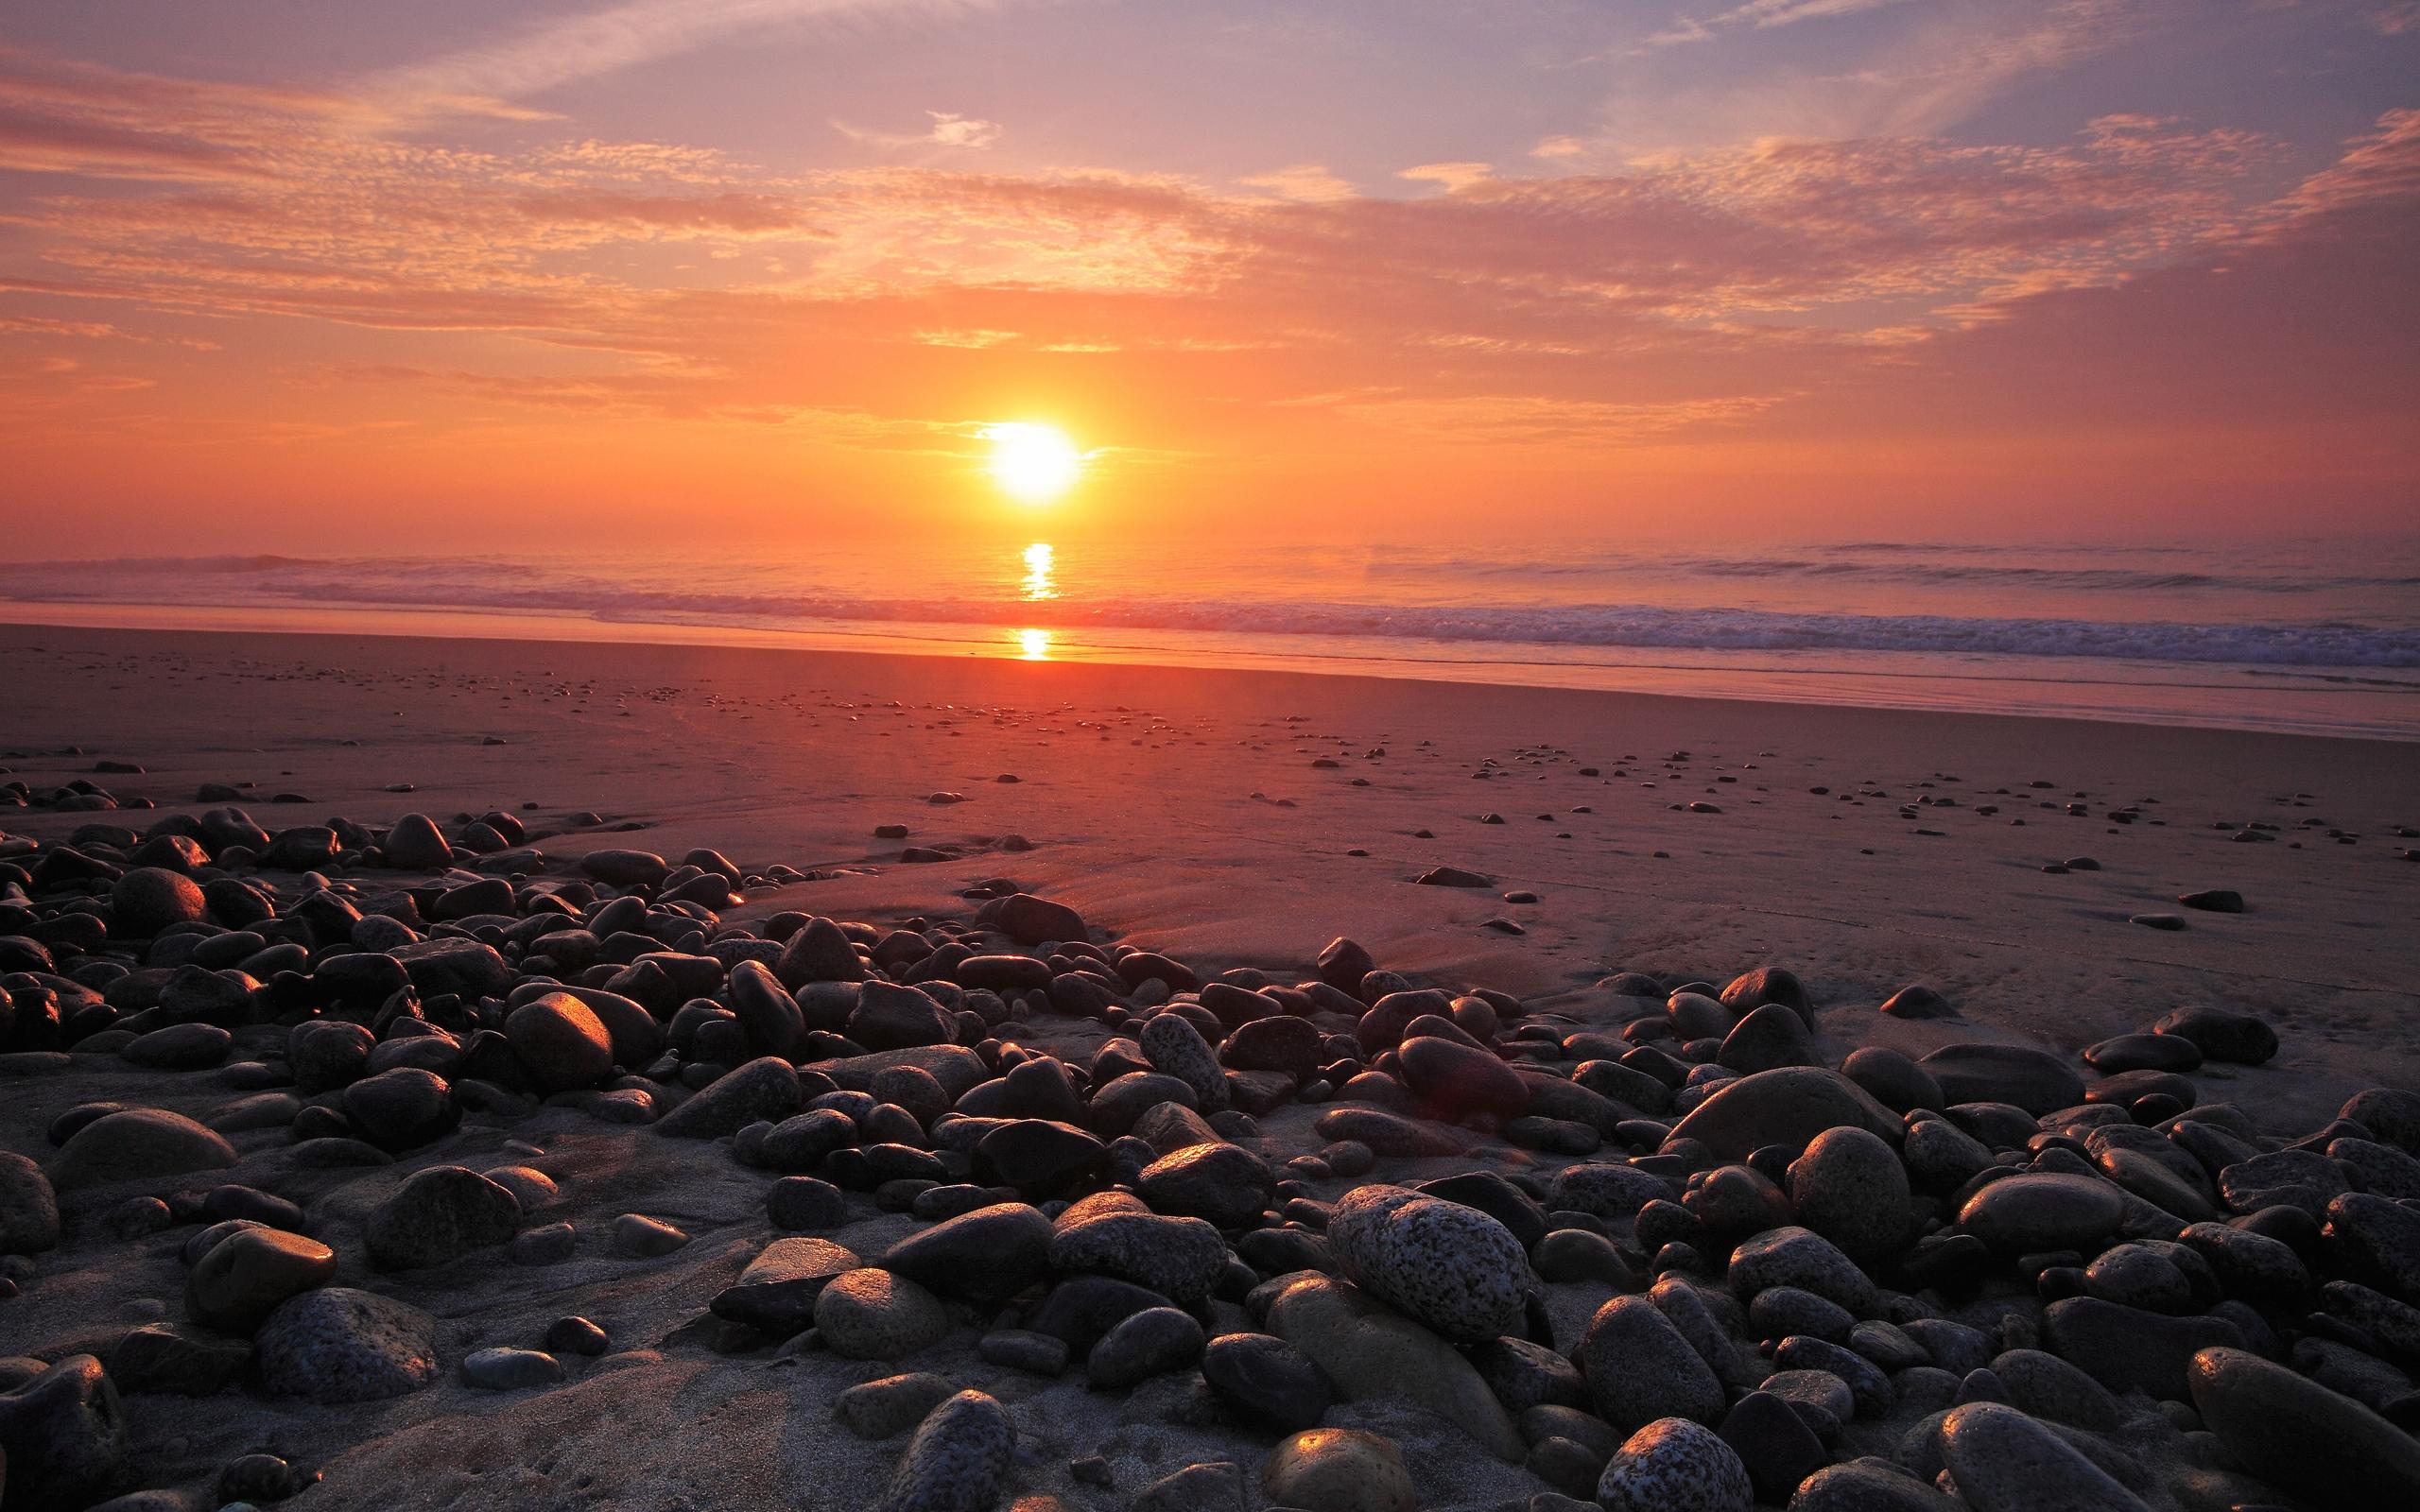 закат камень берег море sunset stone shore sea  № 1023657 загрузить